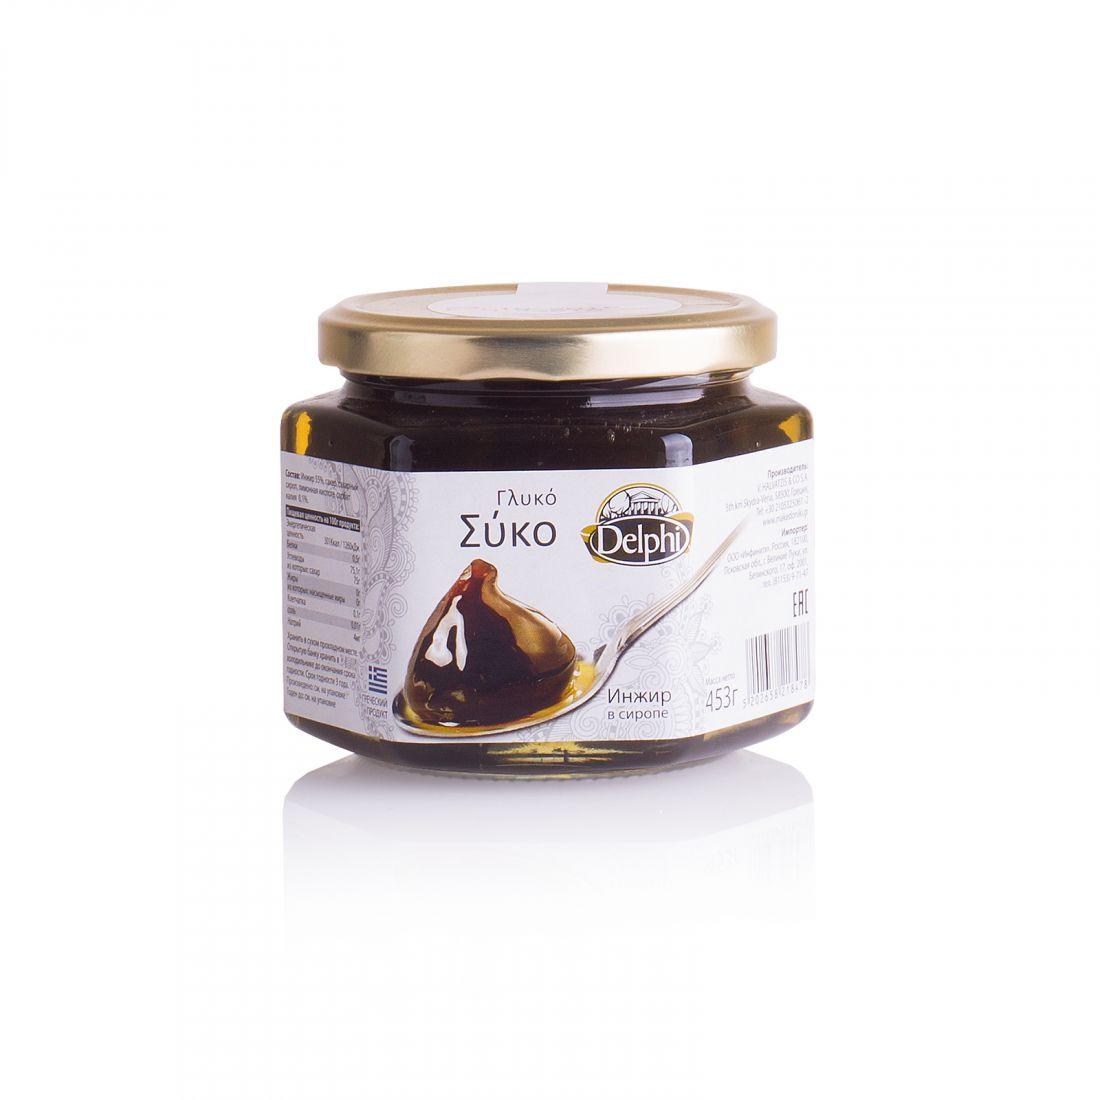 Инжир в сиропе Delphi - 453 гр